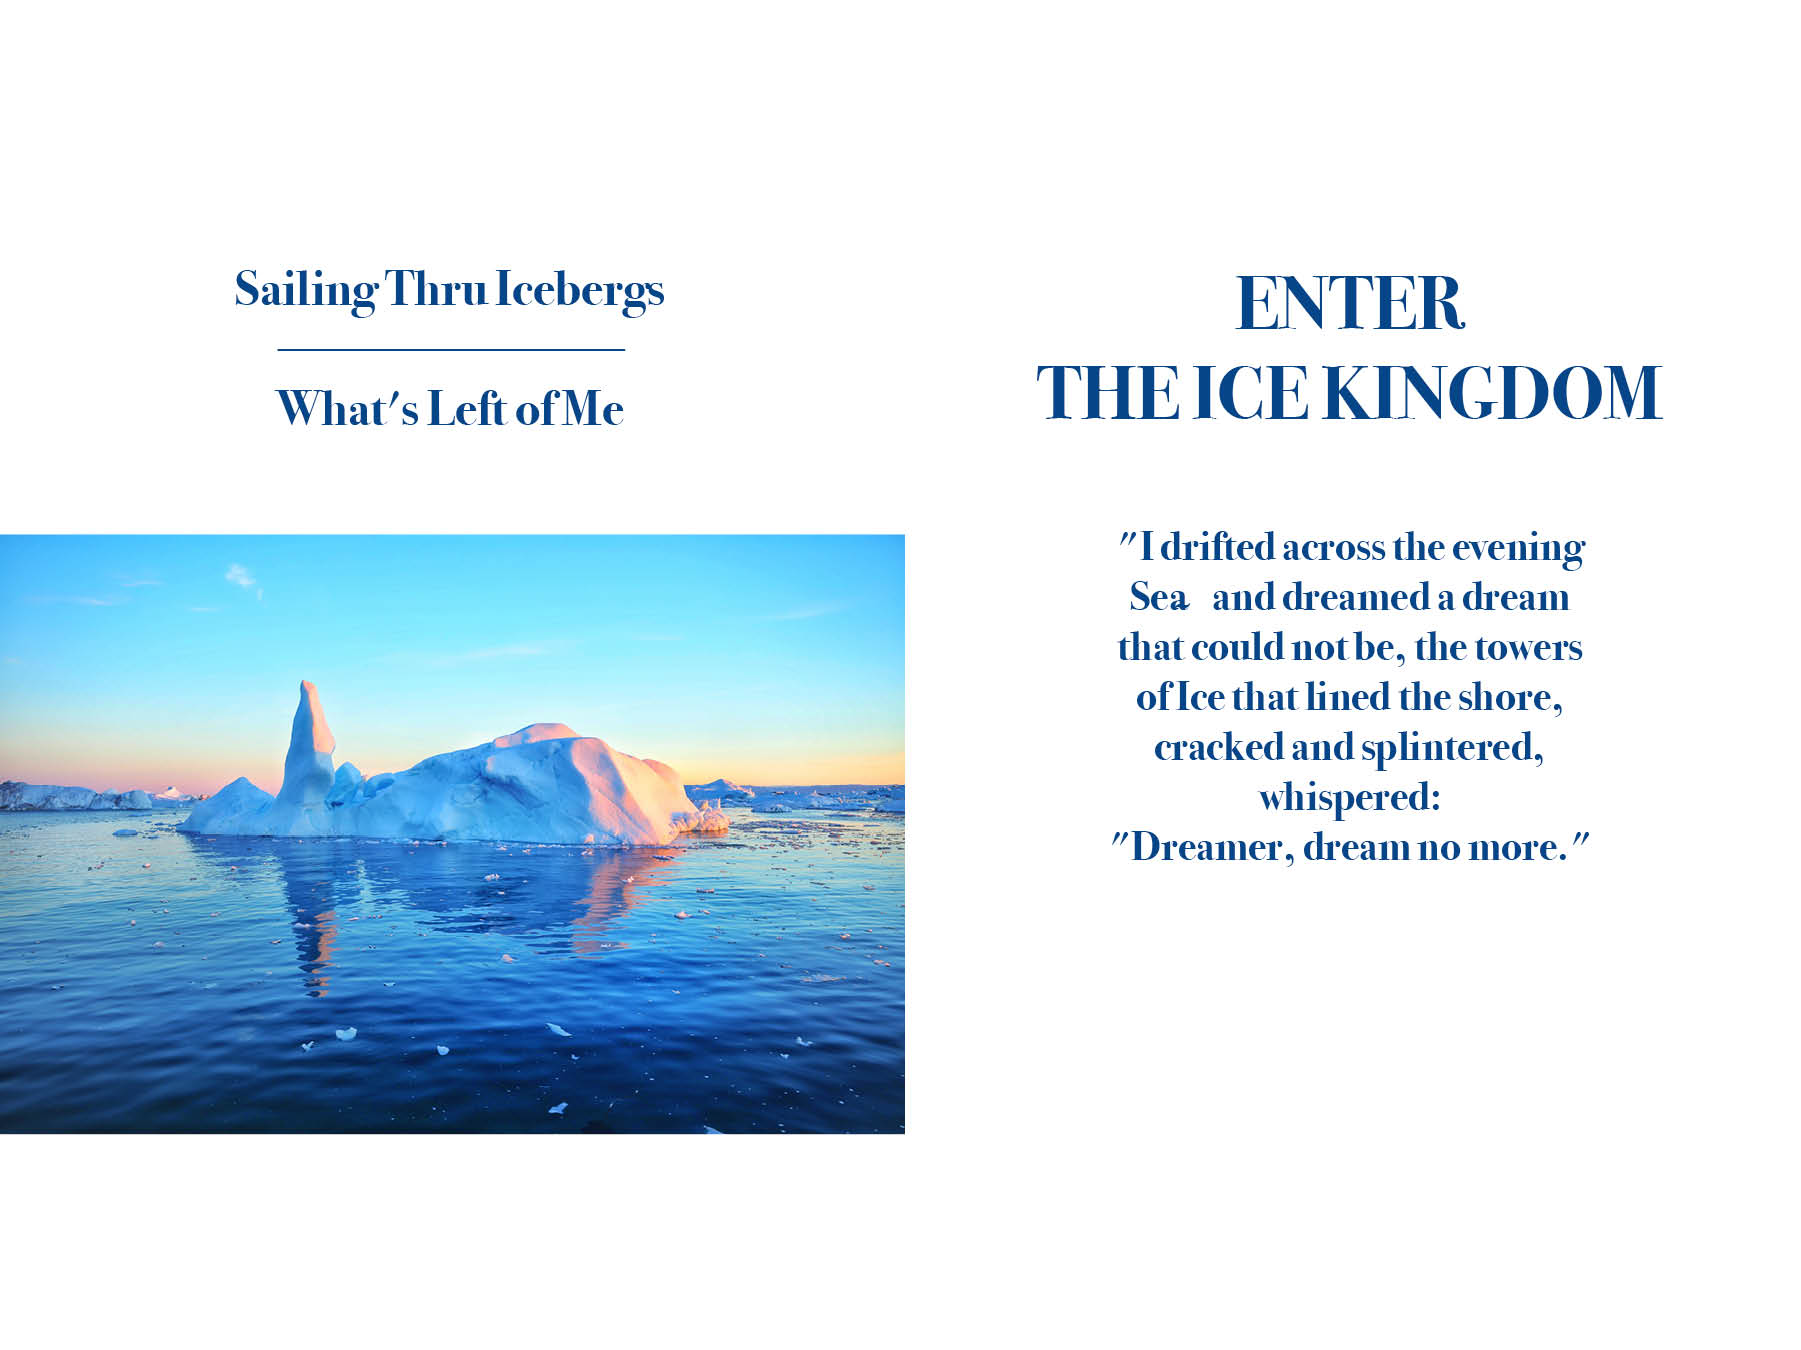 Sailing_Thru_Icebergs_article_2.jpg